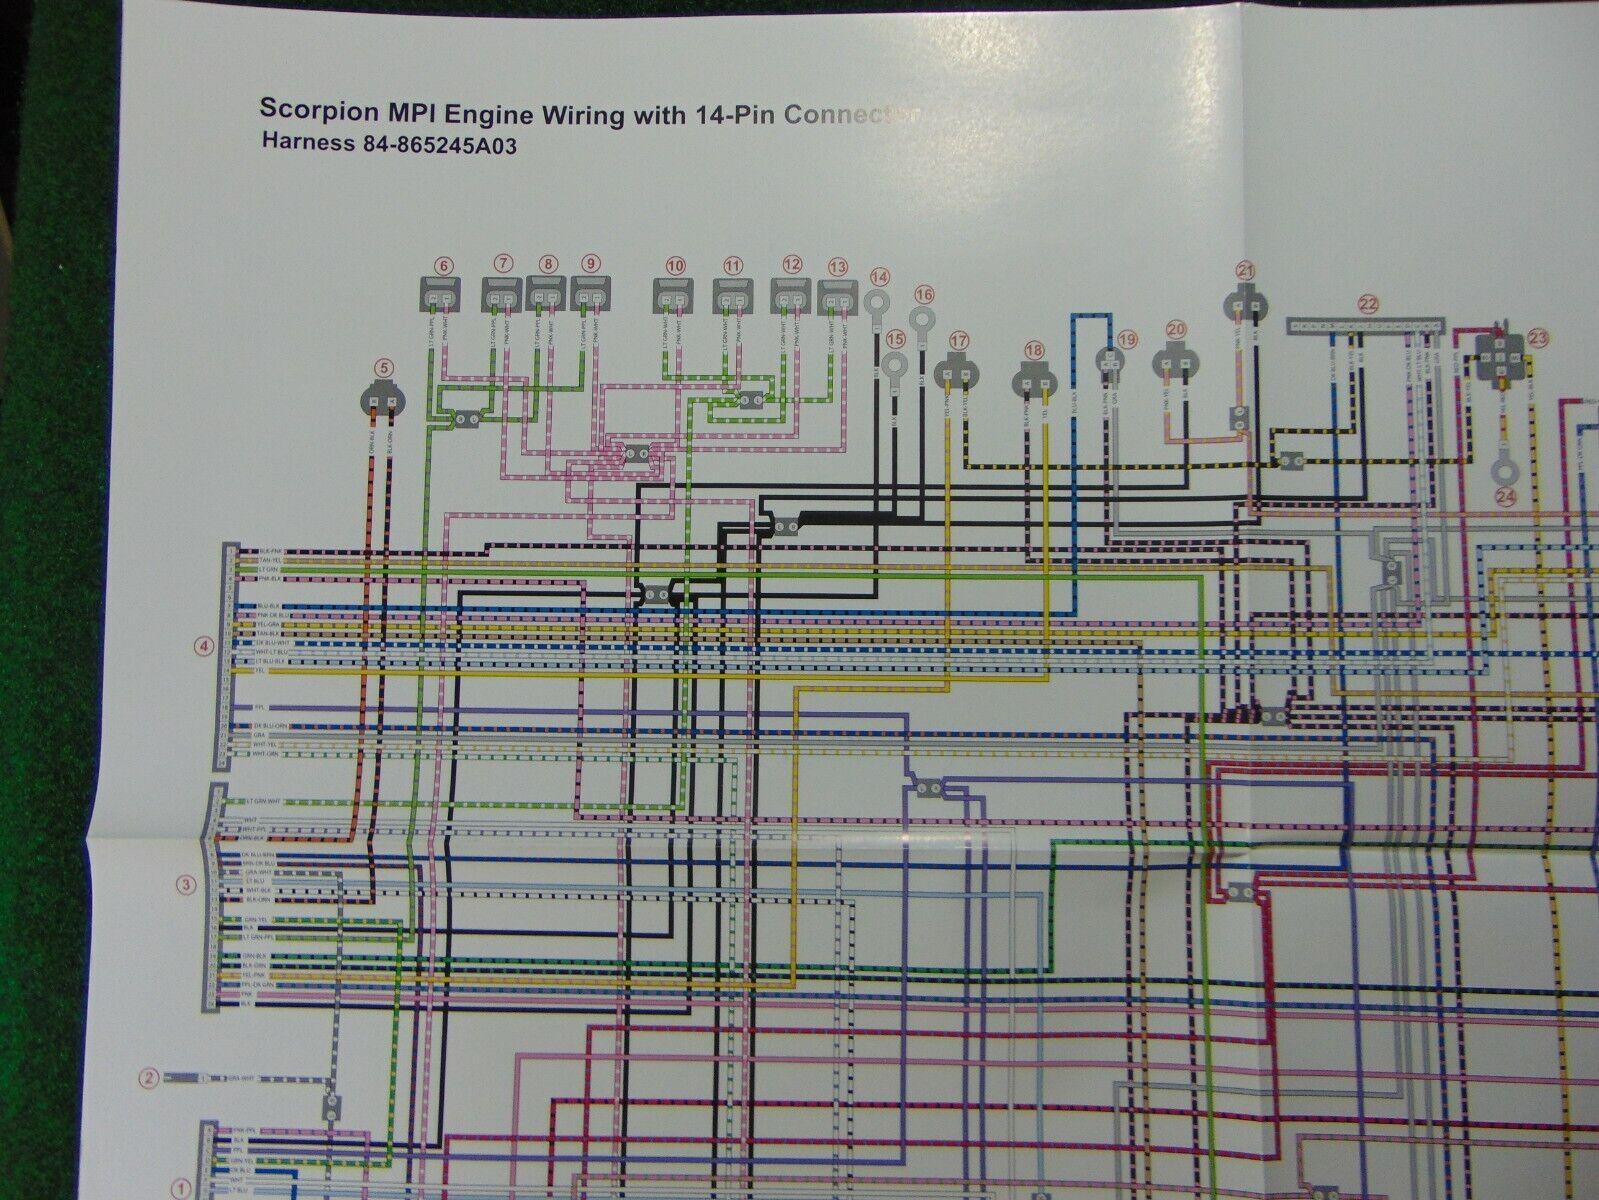 MerCruiser Scorpion MPI Engine Wiring 14 Pin Connector Wiring Harness  Diagram   eBayeBay